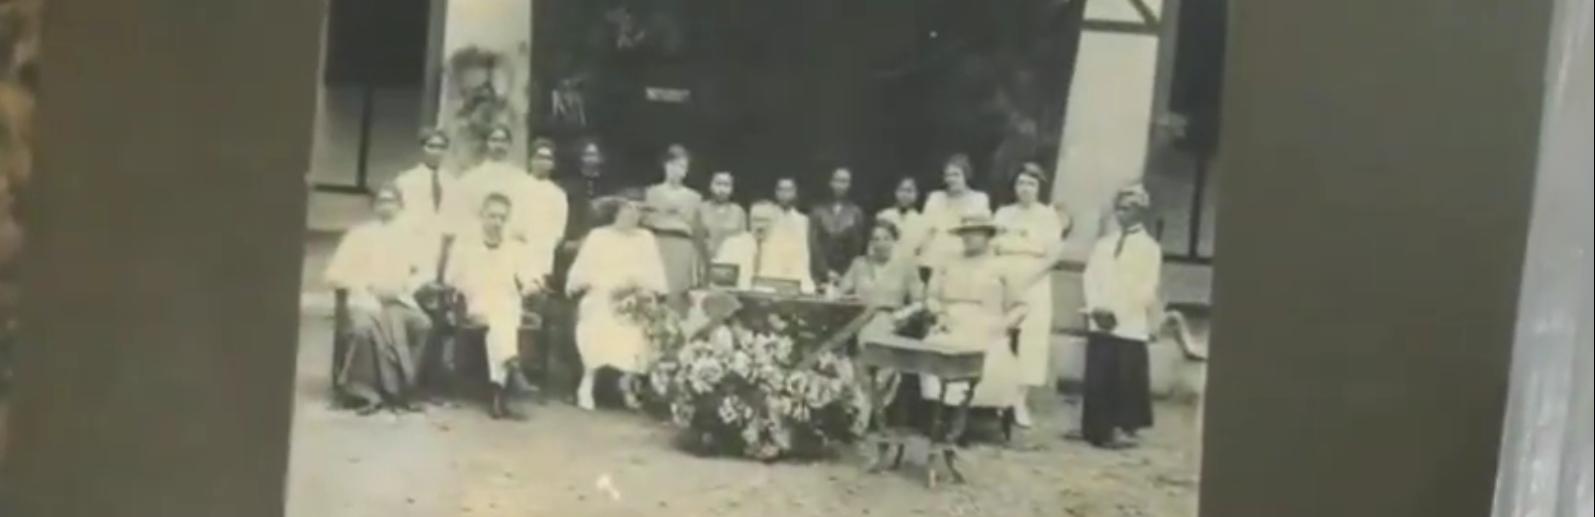 Restoration of Historical Photos of RM Margono Djojohadikusumo's Family